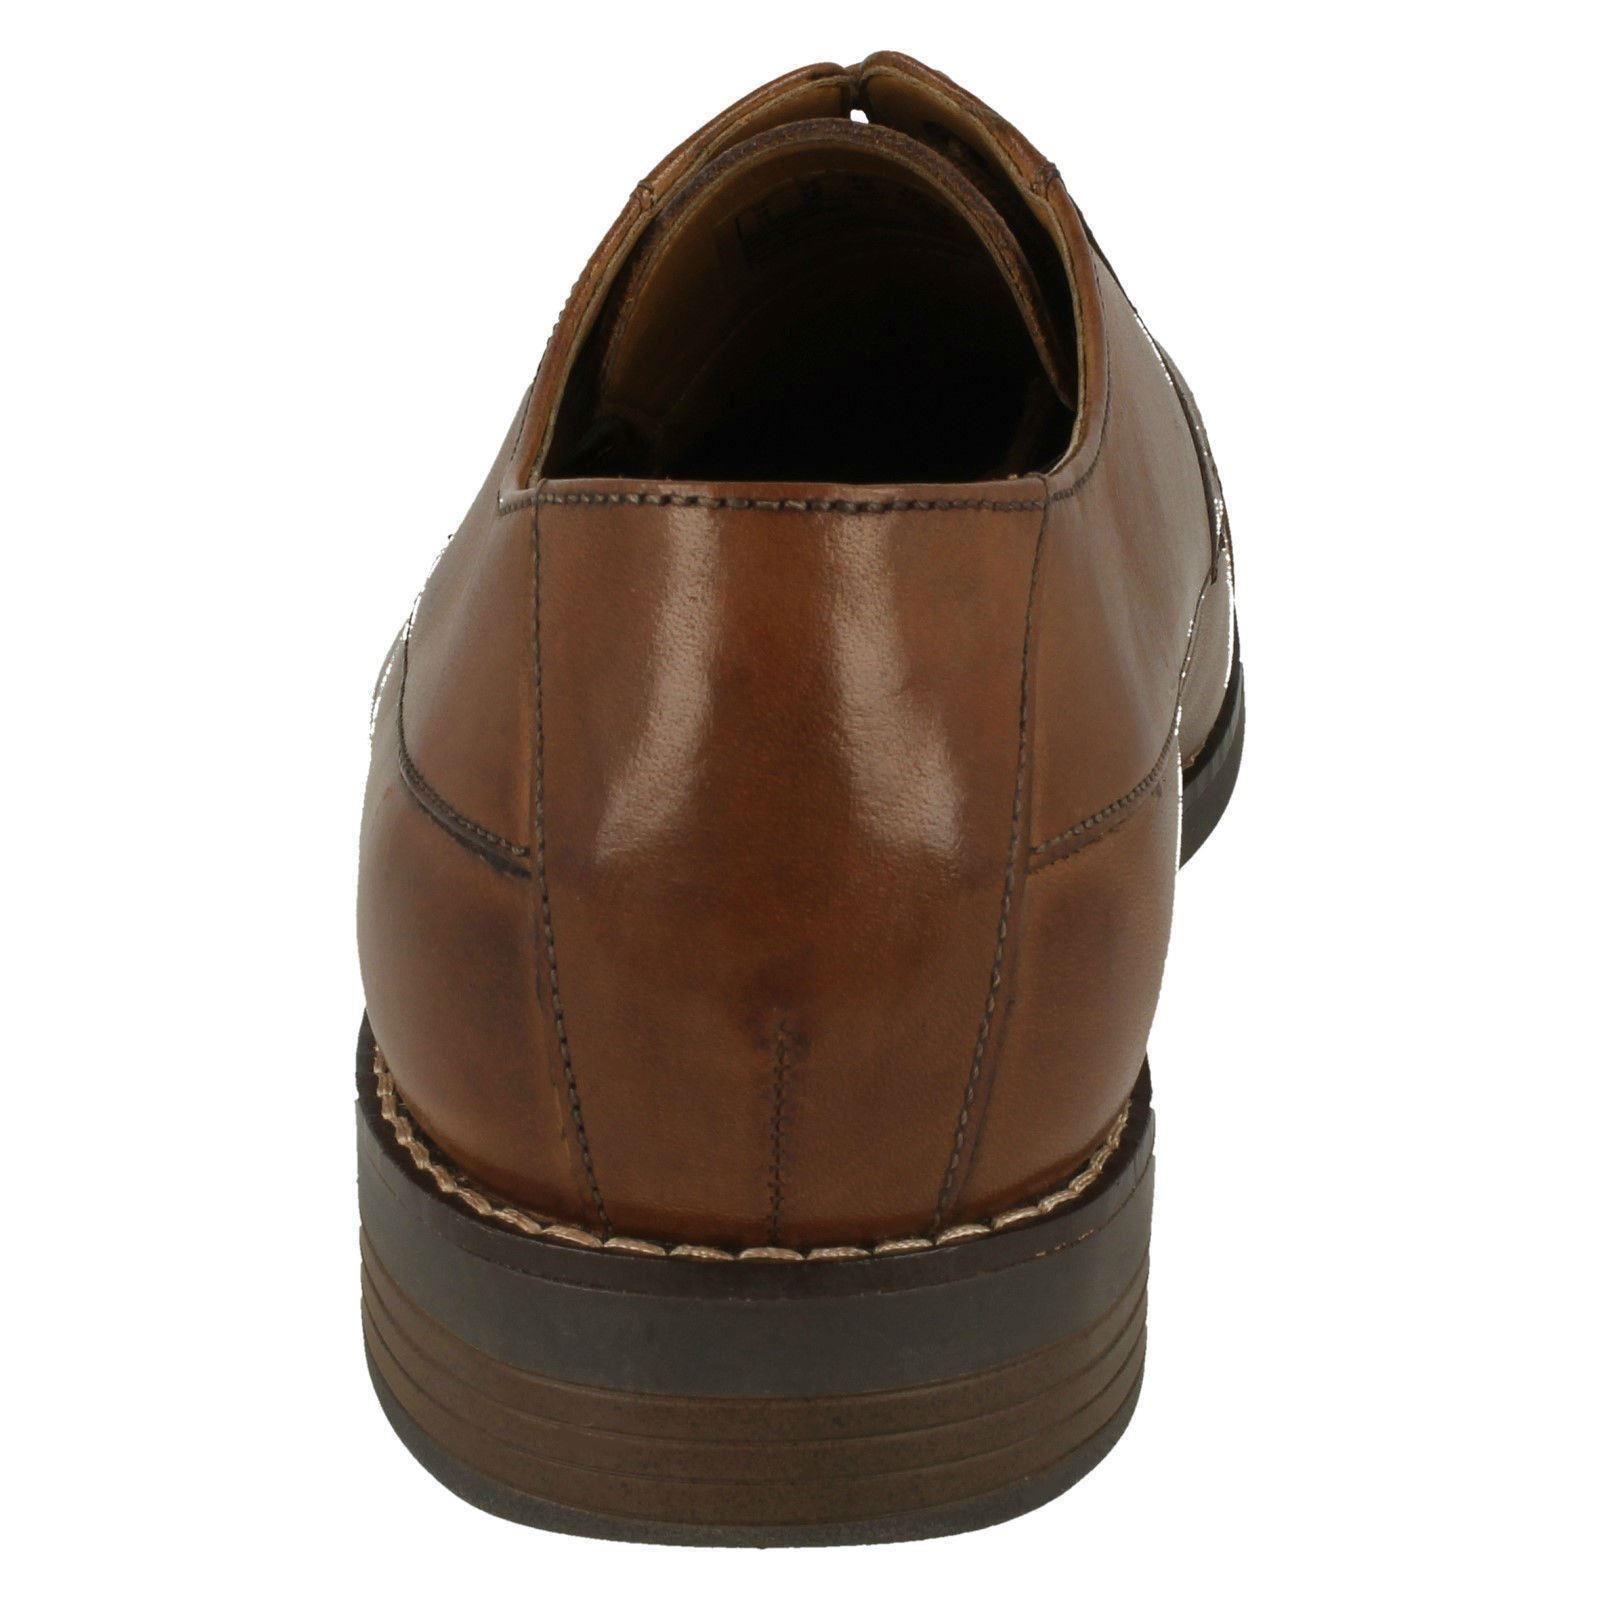 Herren Clarks Smart Schnürschuh Becken Kappe